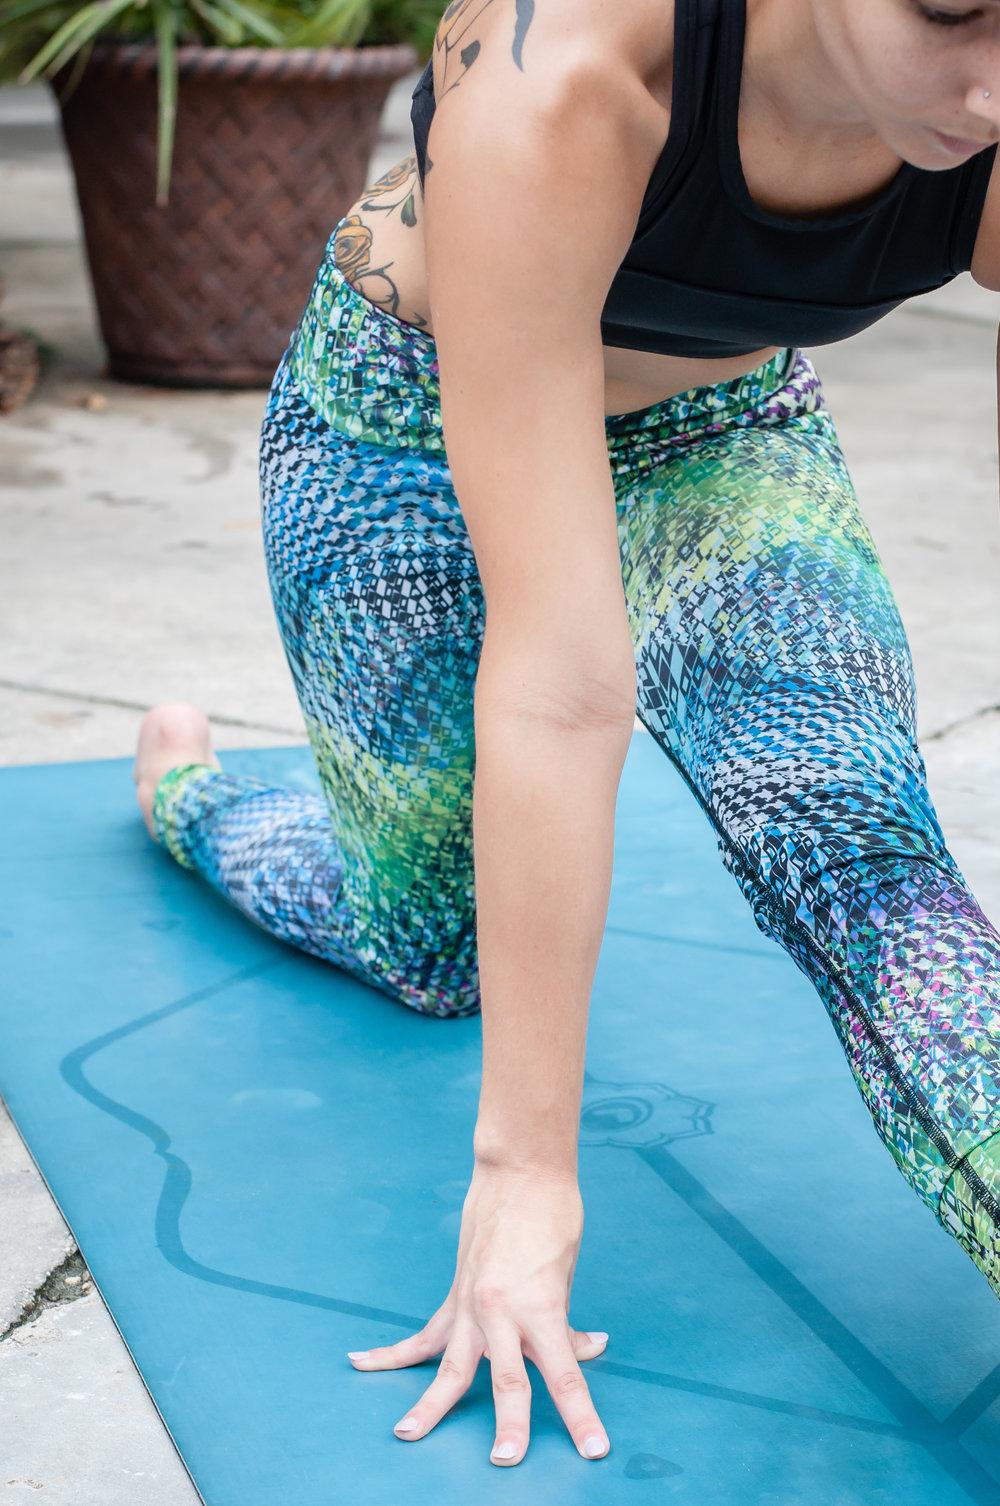 yoga-photoshoot-orlando-photographer-21.jpg